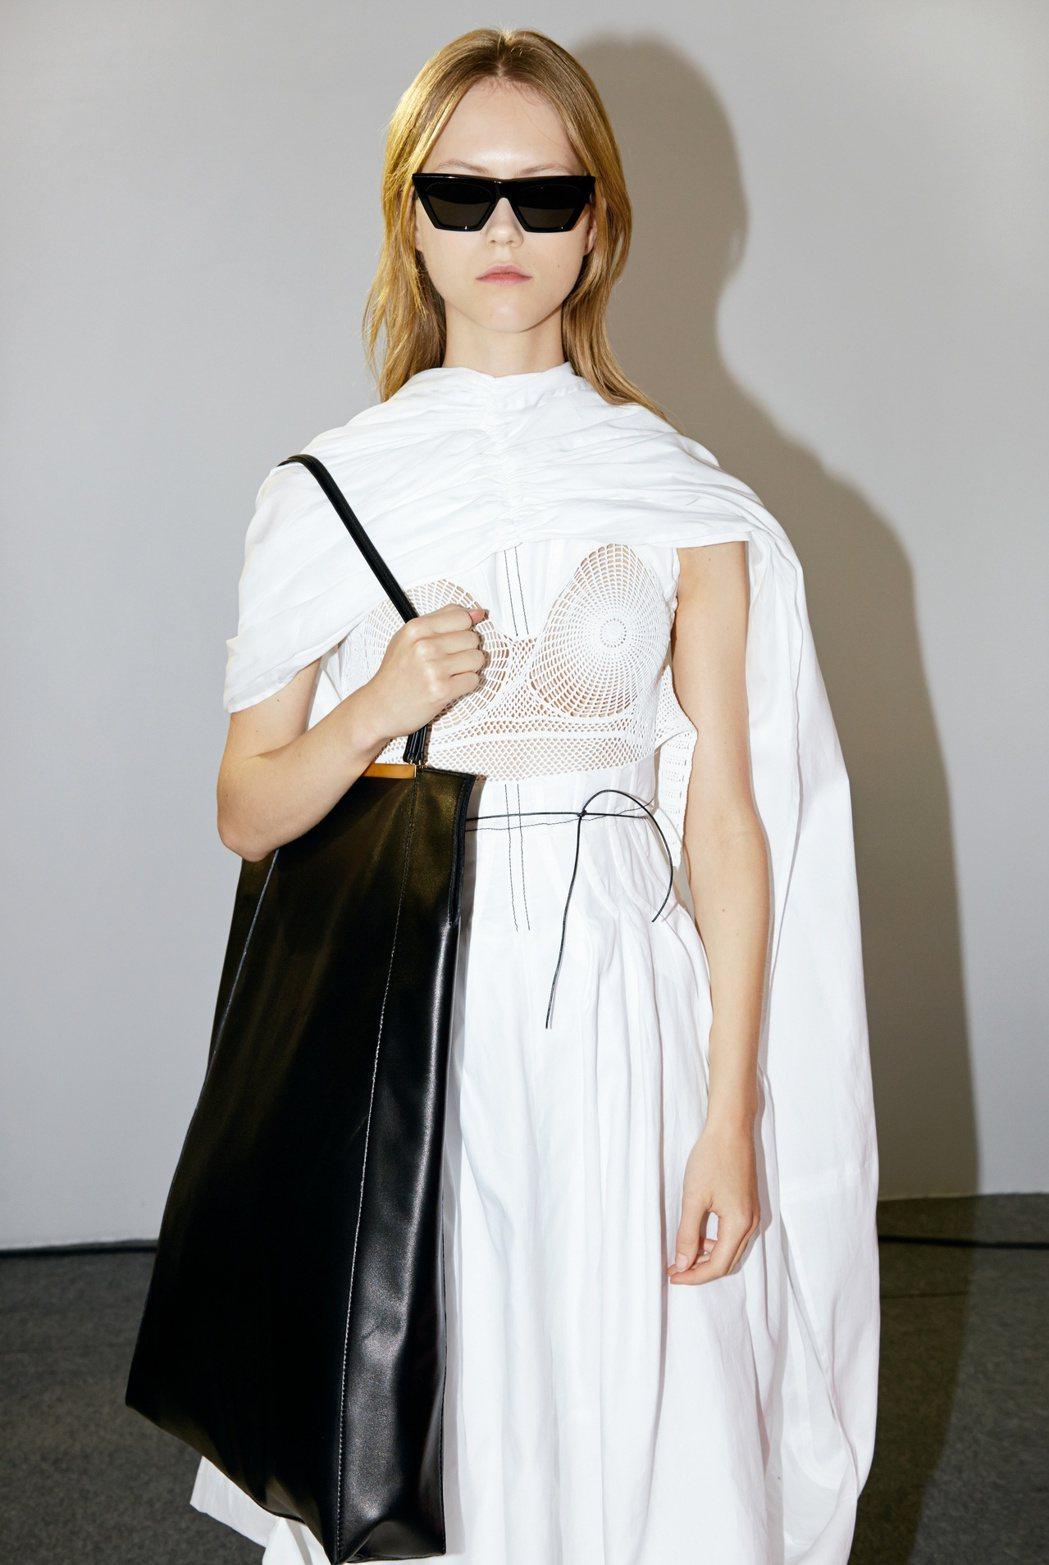 CLASP CABAS黝黑色平滑小牛皮肩背包,售價155,000 元。圖/CEL...